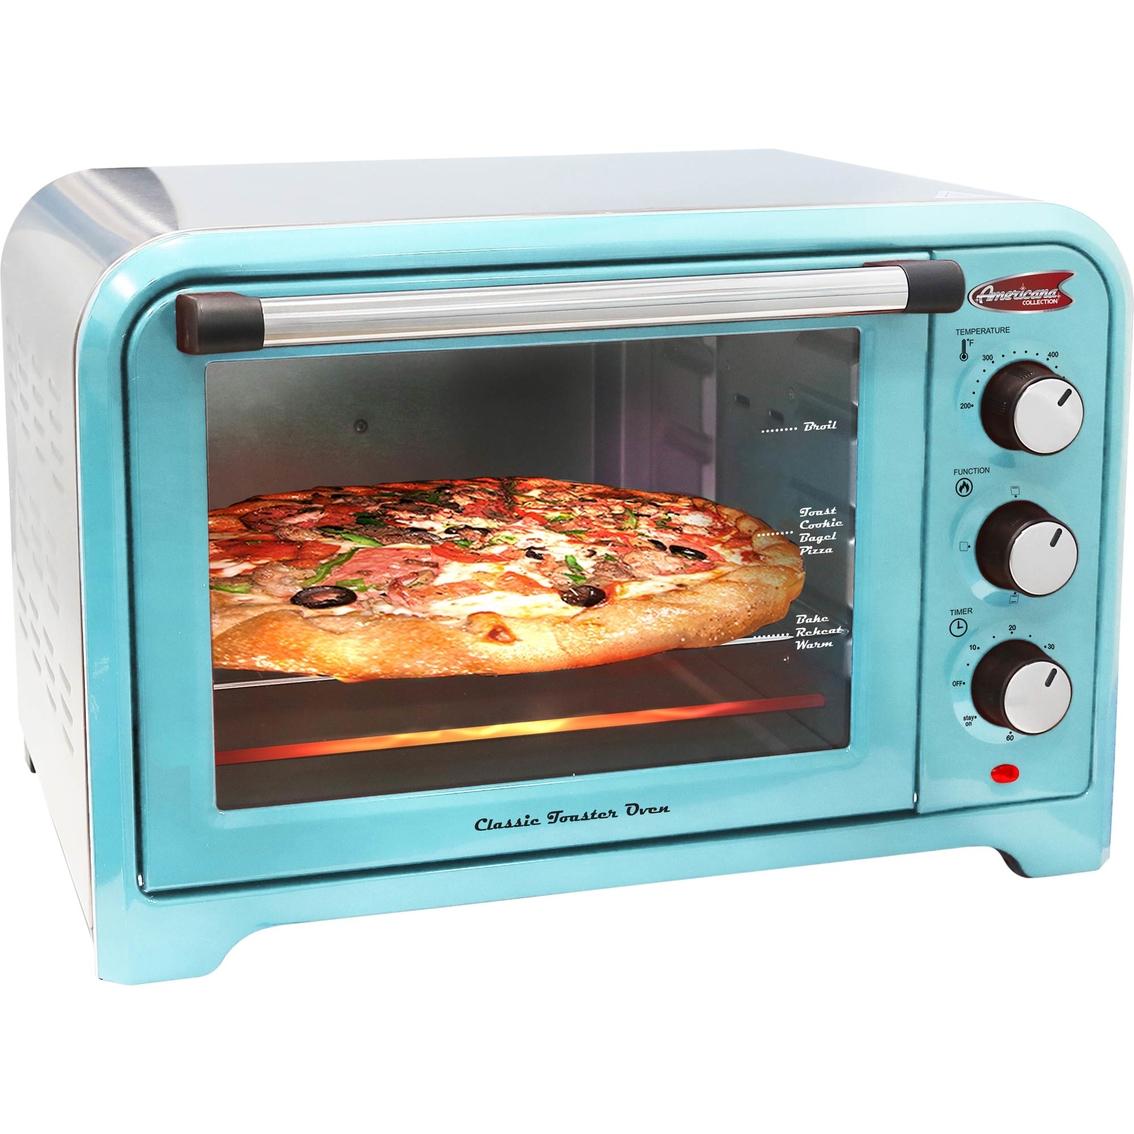 Elite Americana Ero-2600 6 Slice Retro Toaster Oven